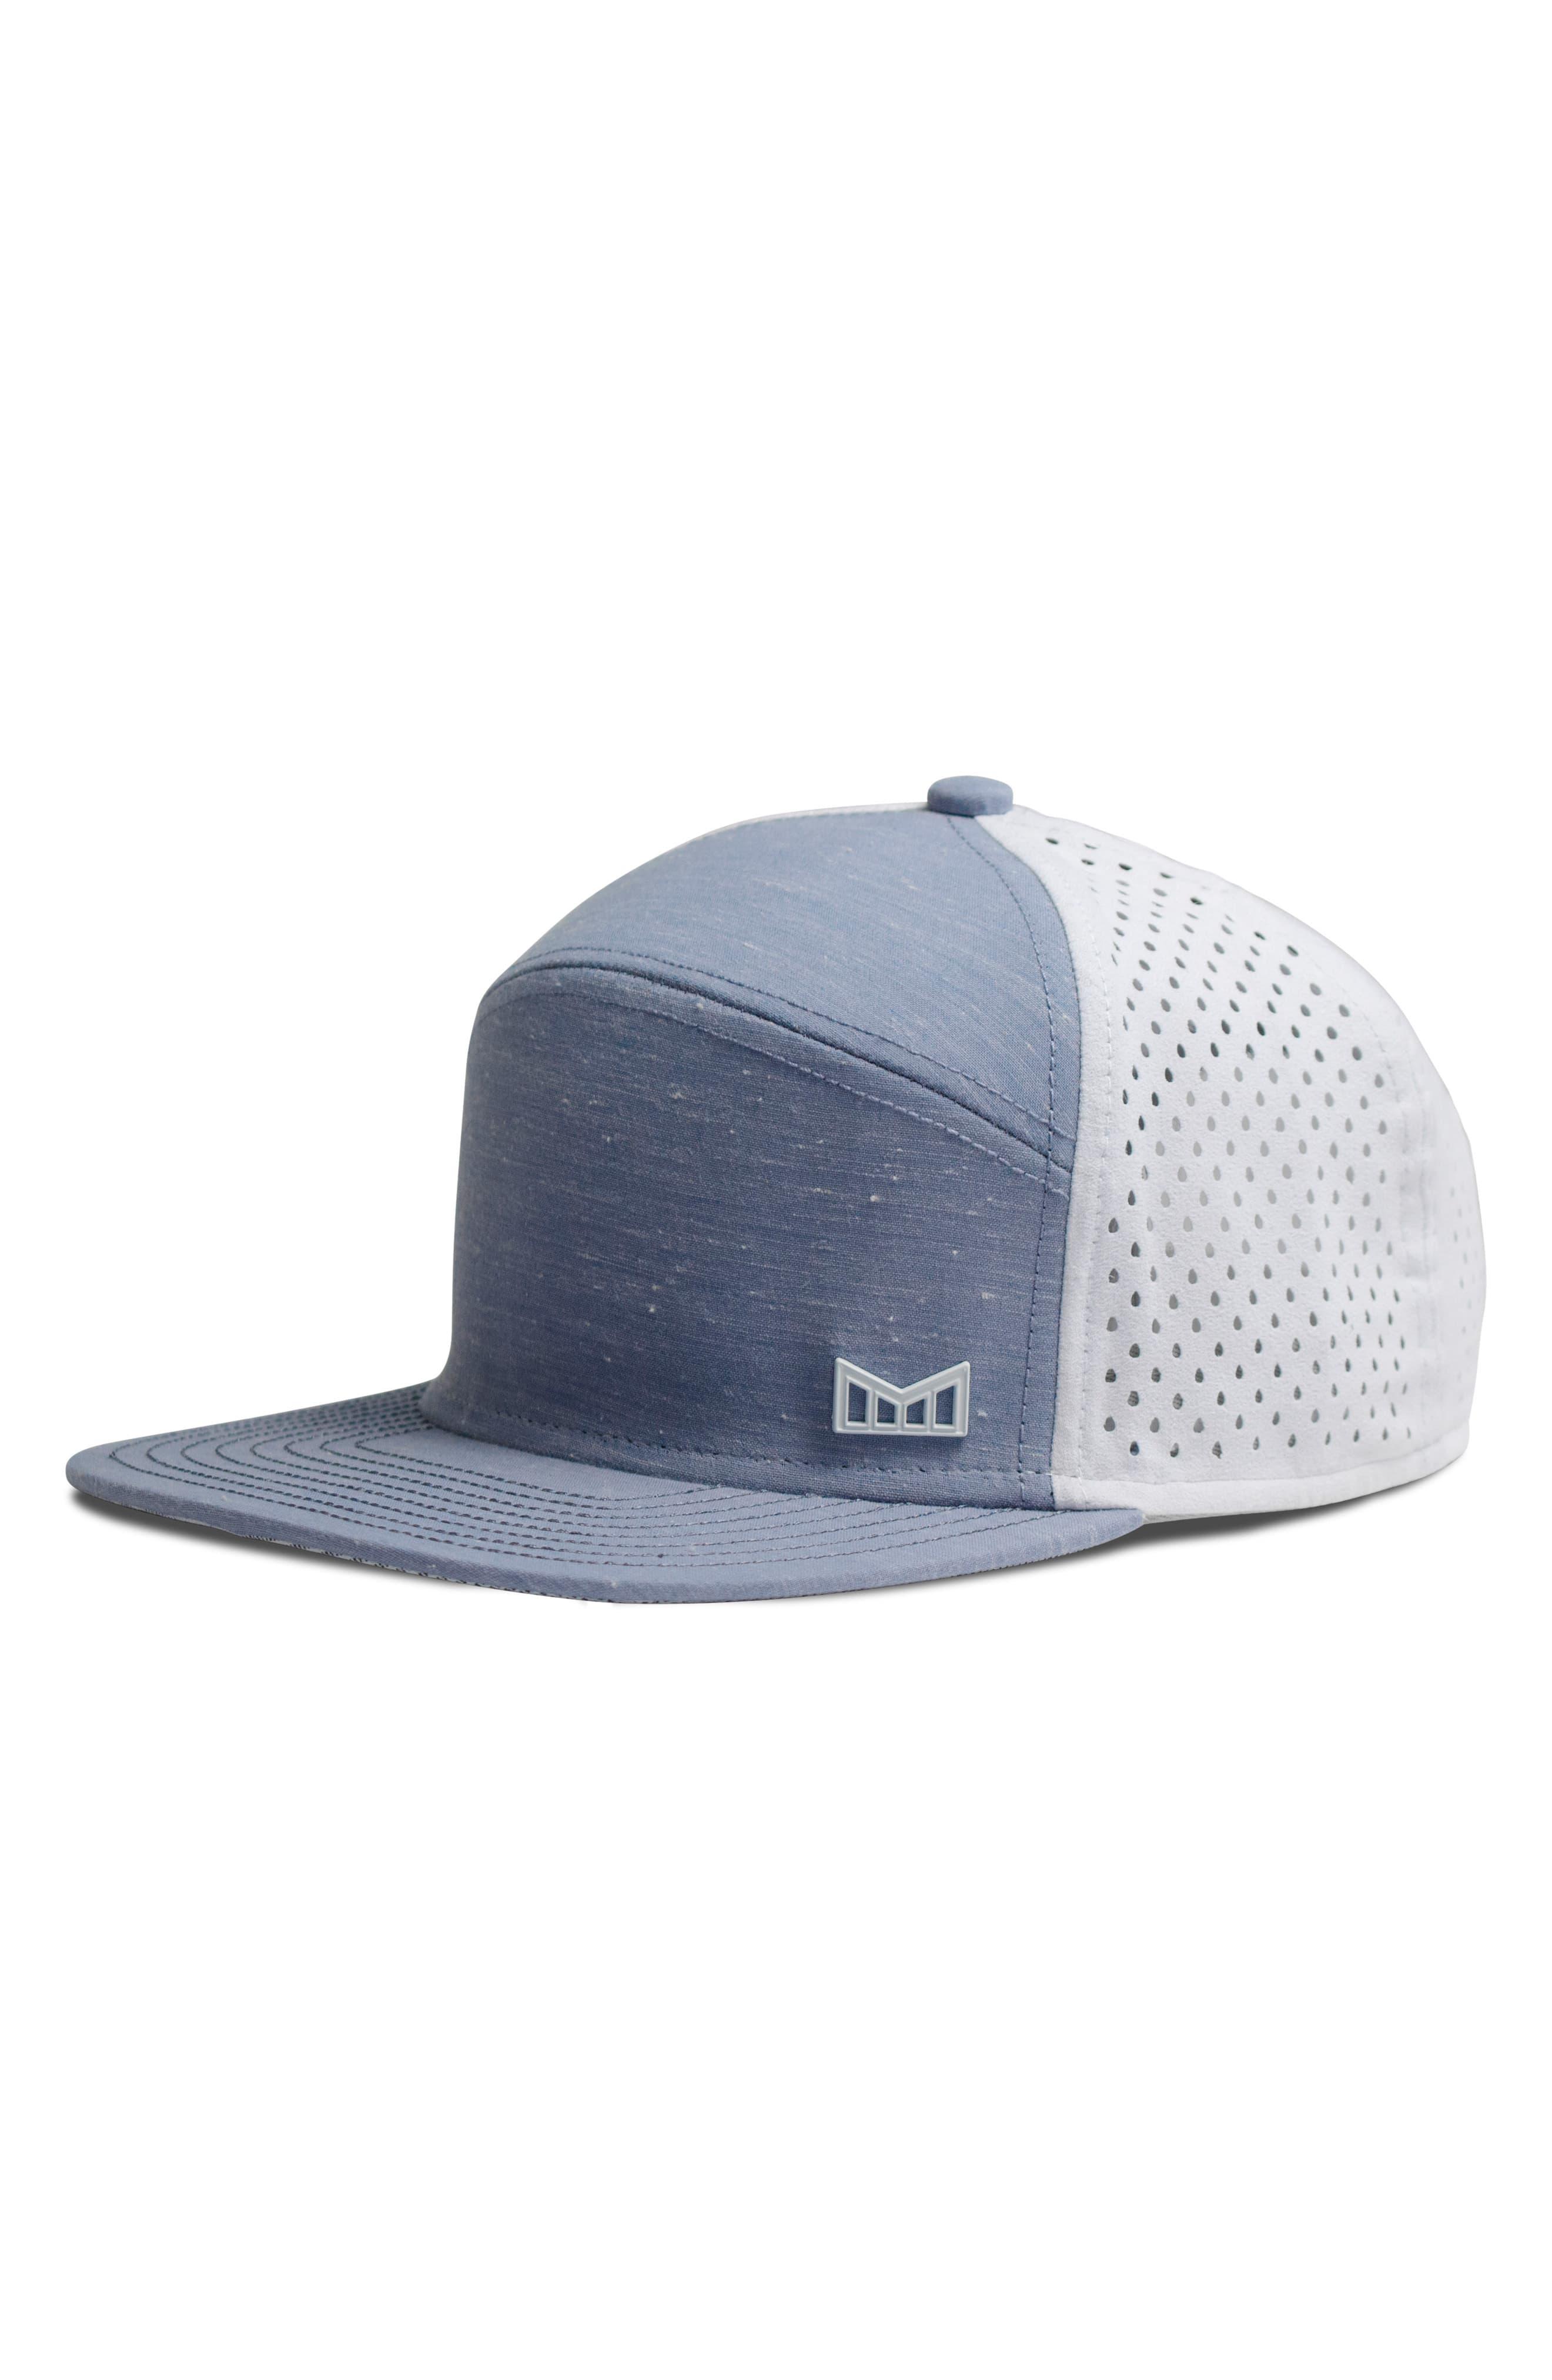 online store b4b62 1a14d Men s Melin Trenches Snapback Baseball Cap - Blue